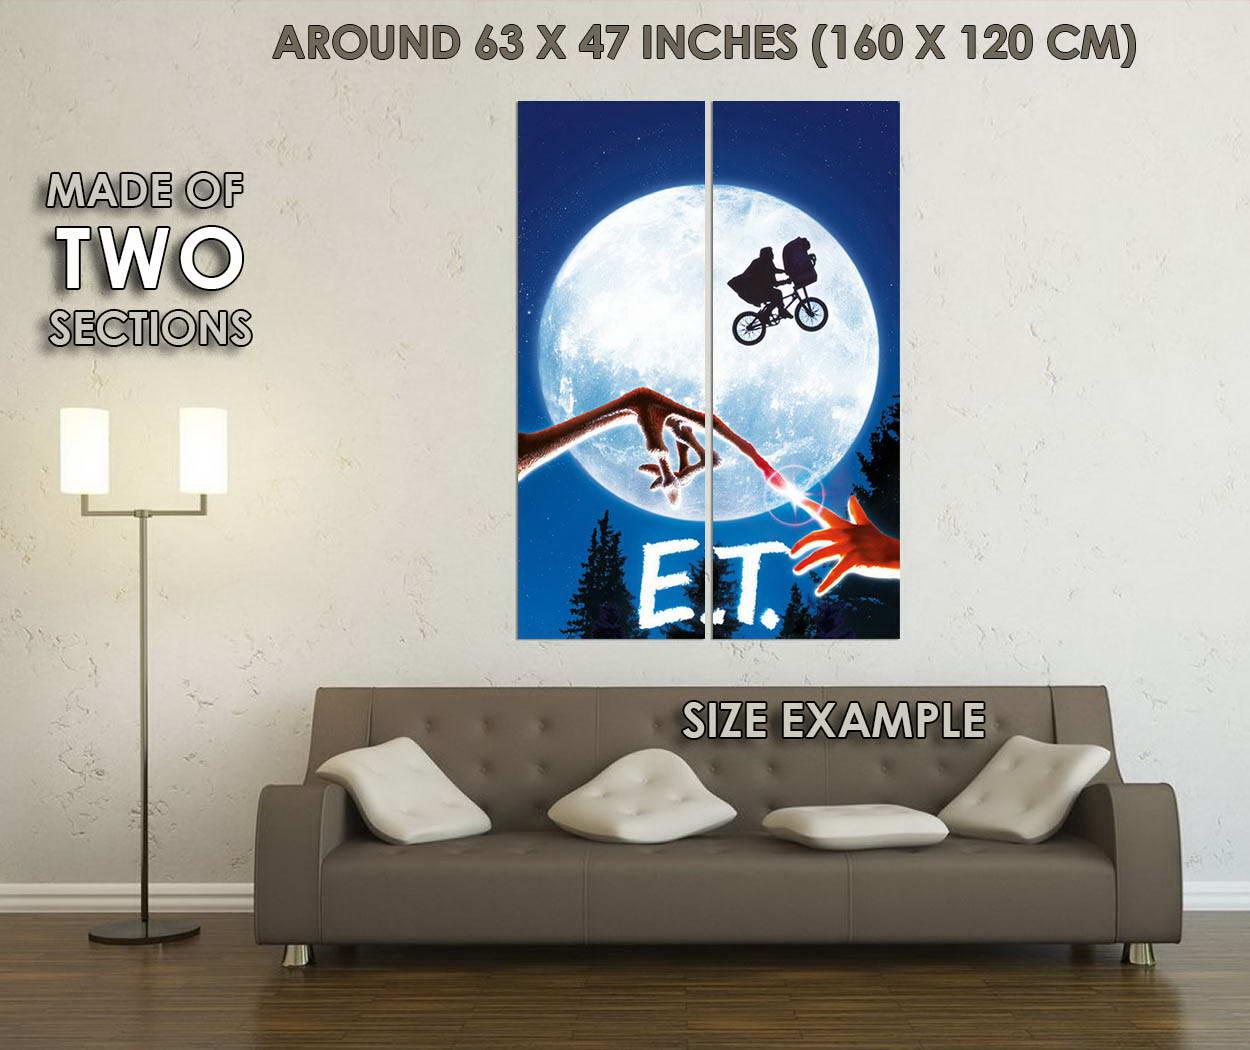 10218-E-T-The-Extra-Terrestrial-Movie-LAMINATED-POSTER-CA thumbnail 6